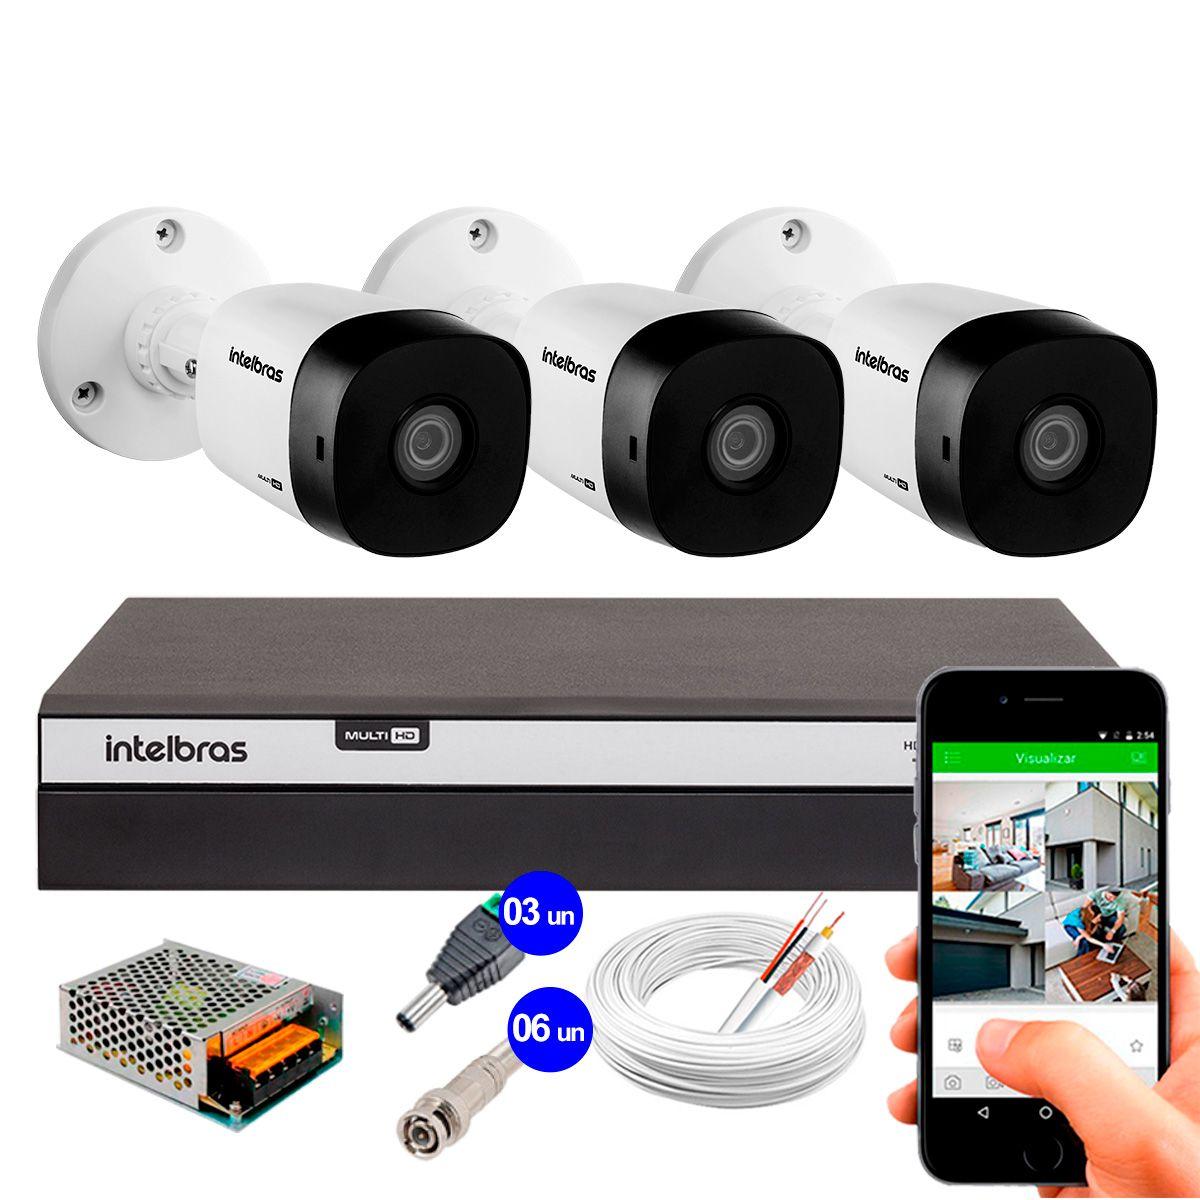 Kit 3 Câmeras de Segurança Full HD 1080p Intelbras VHD 1220B IR + DVR Intelbras Full HD 4 Ch + Acessórios  - Tudo Forte